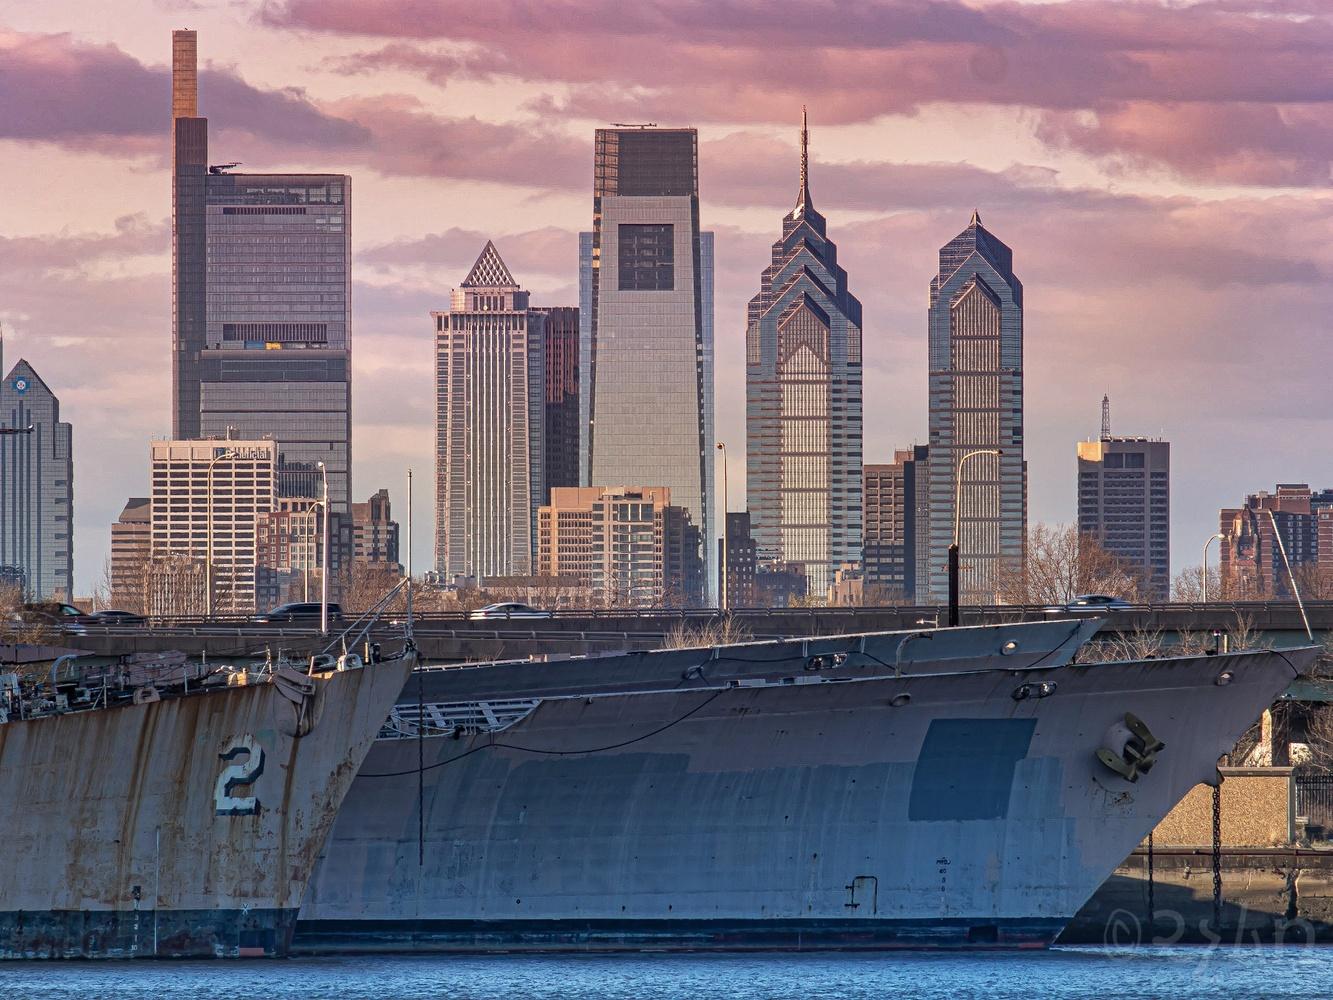 Philadelphia Navy yard by Ryan Hoch